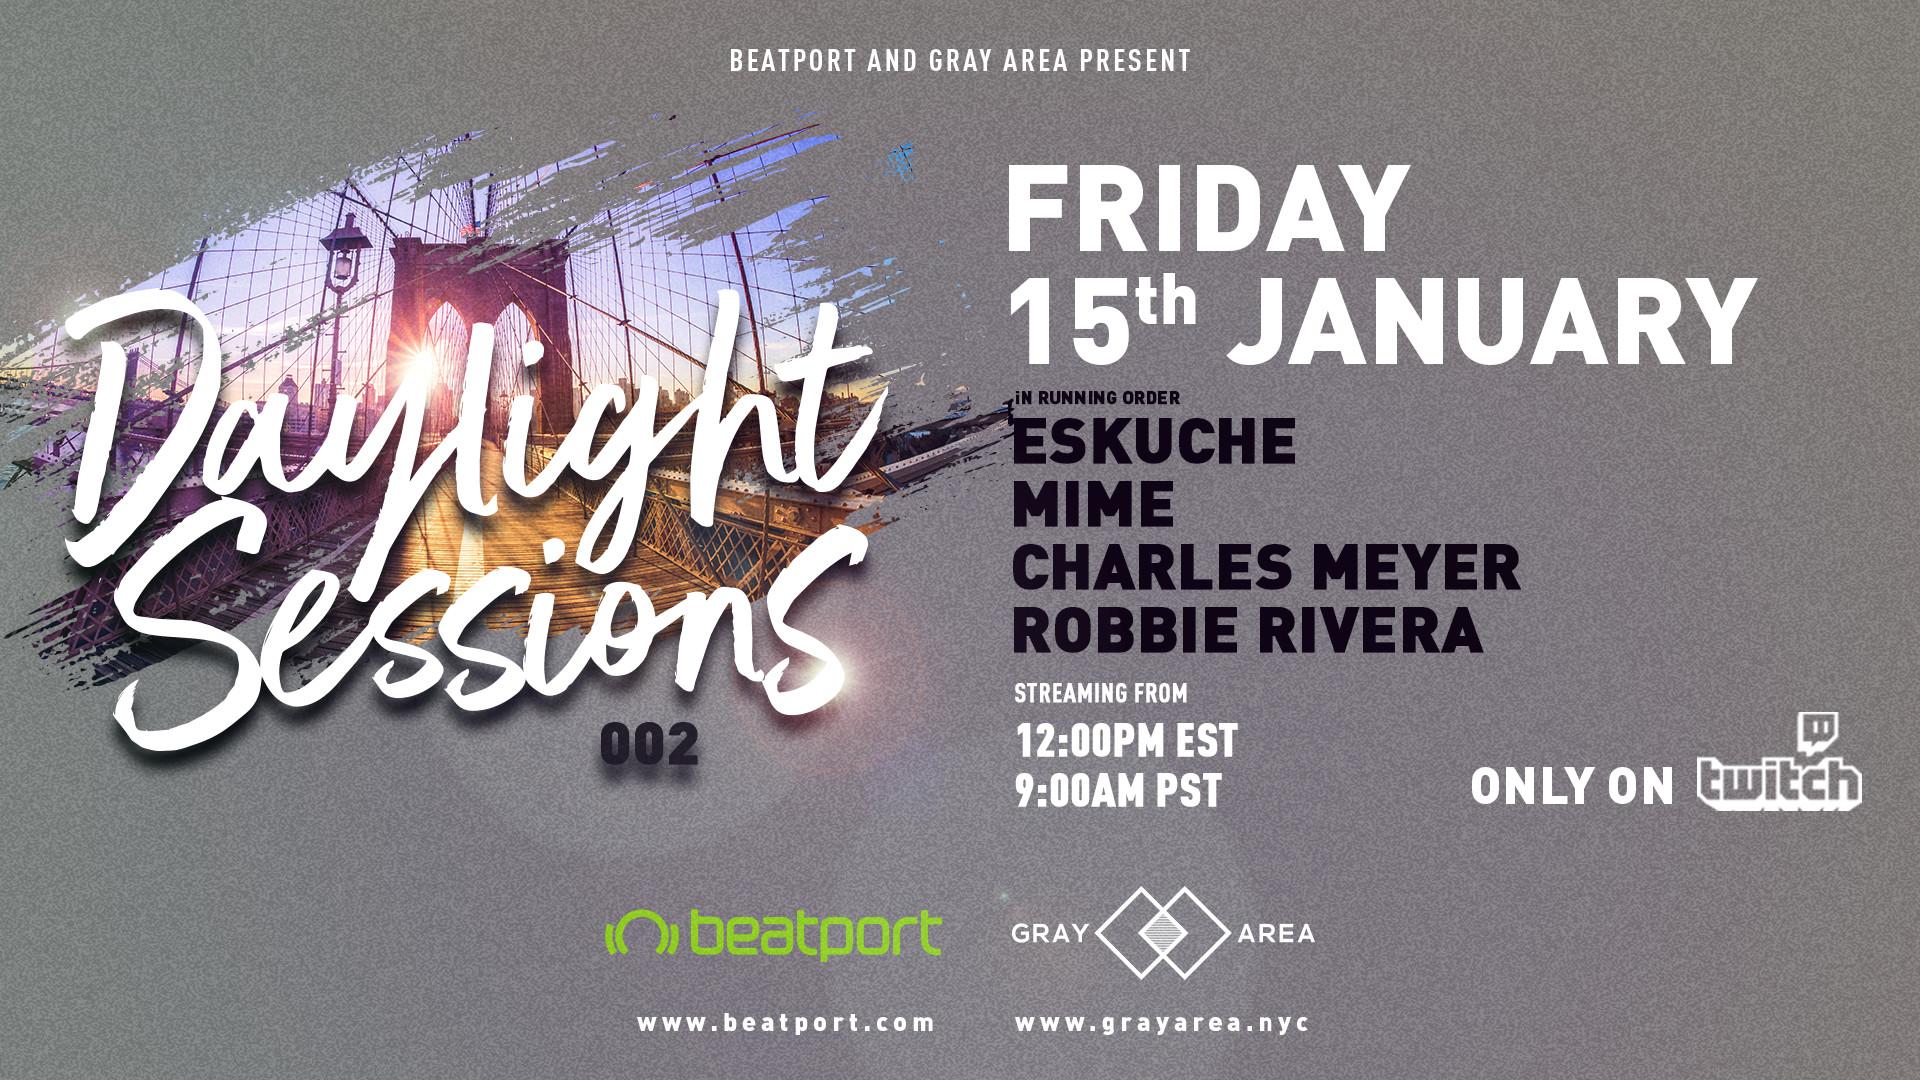 Daylight Sessions 02 w/ Beatport: Eskuche, MIME, Charles Meyer, Robbie Rivera